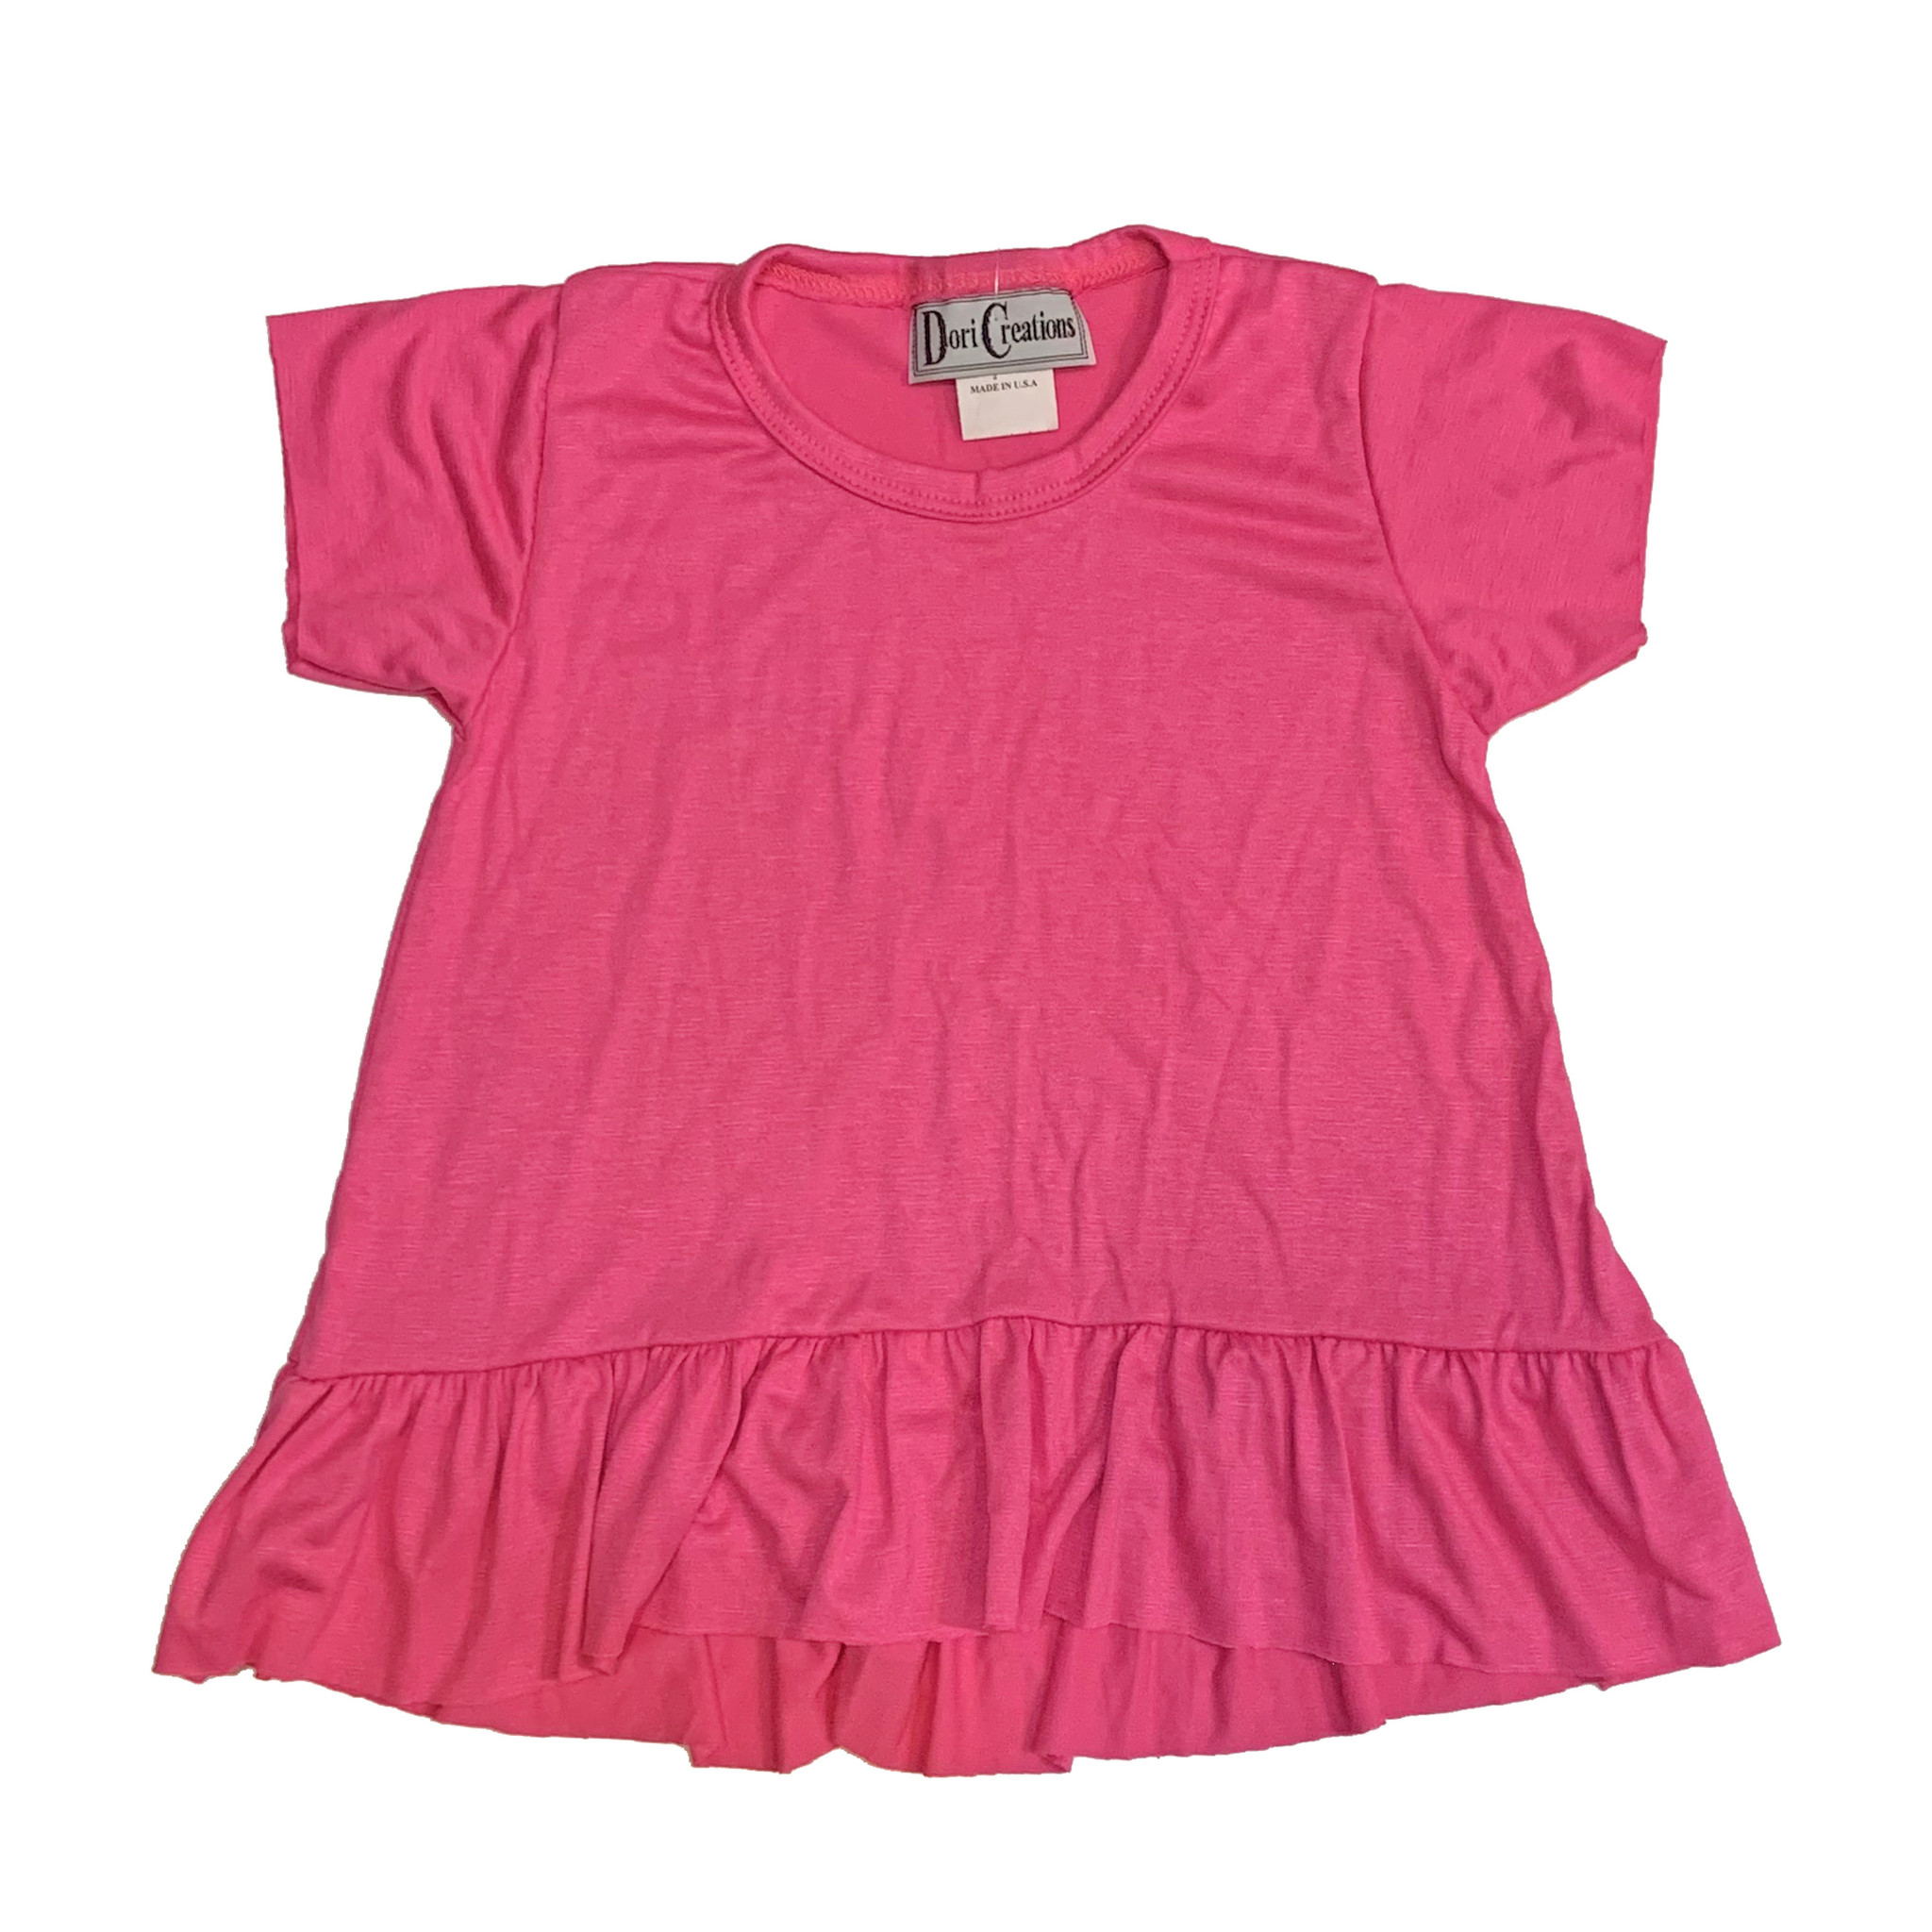 Dori Creations Pink Ruffle Infant Tee